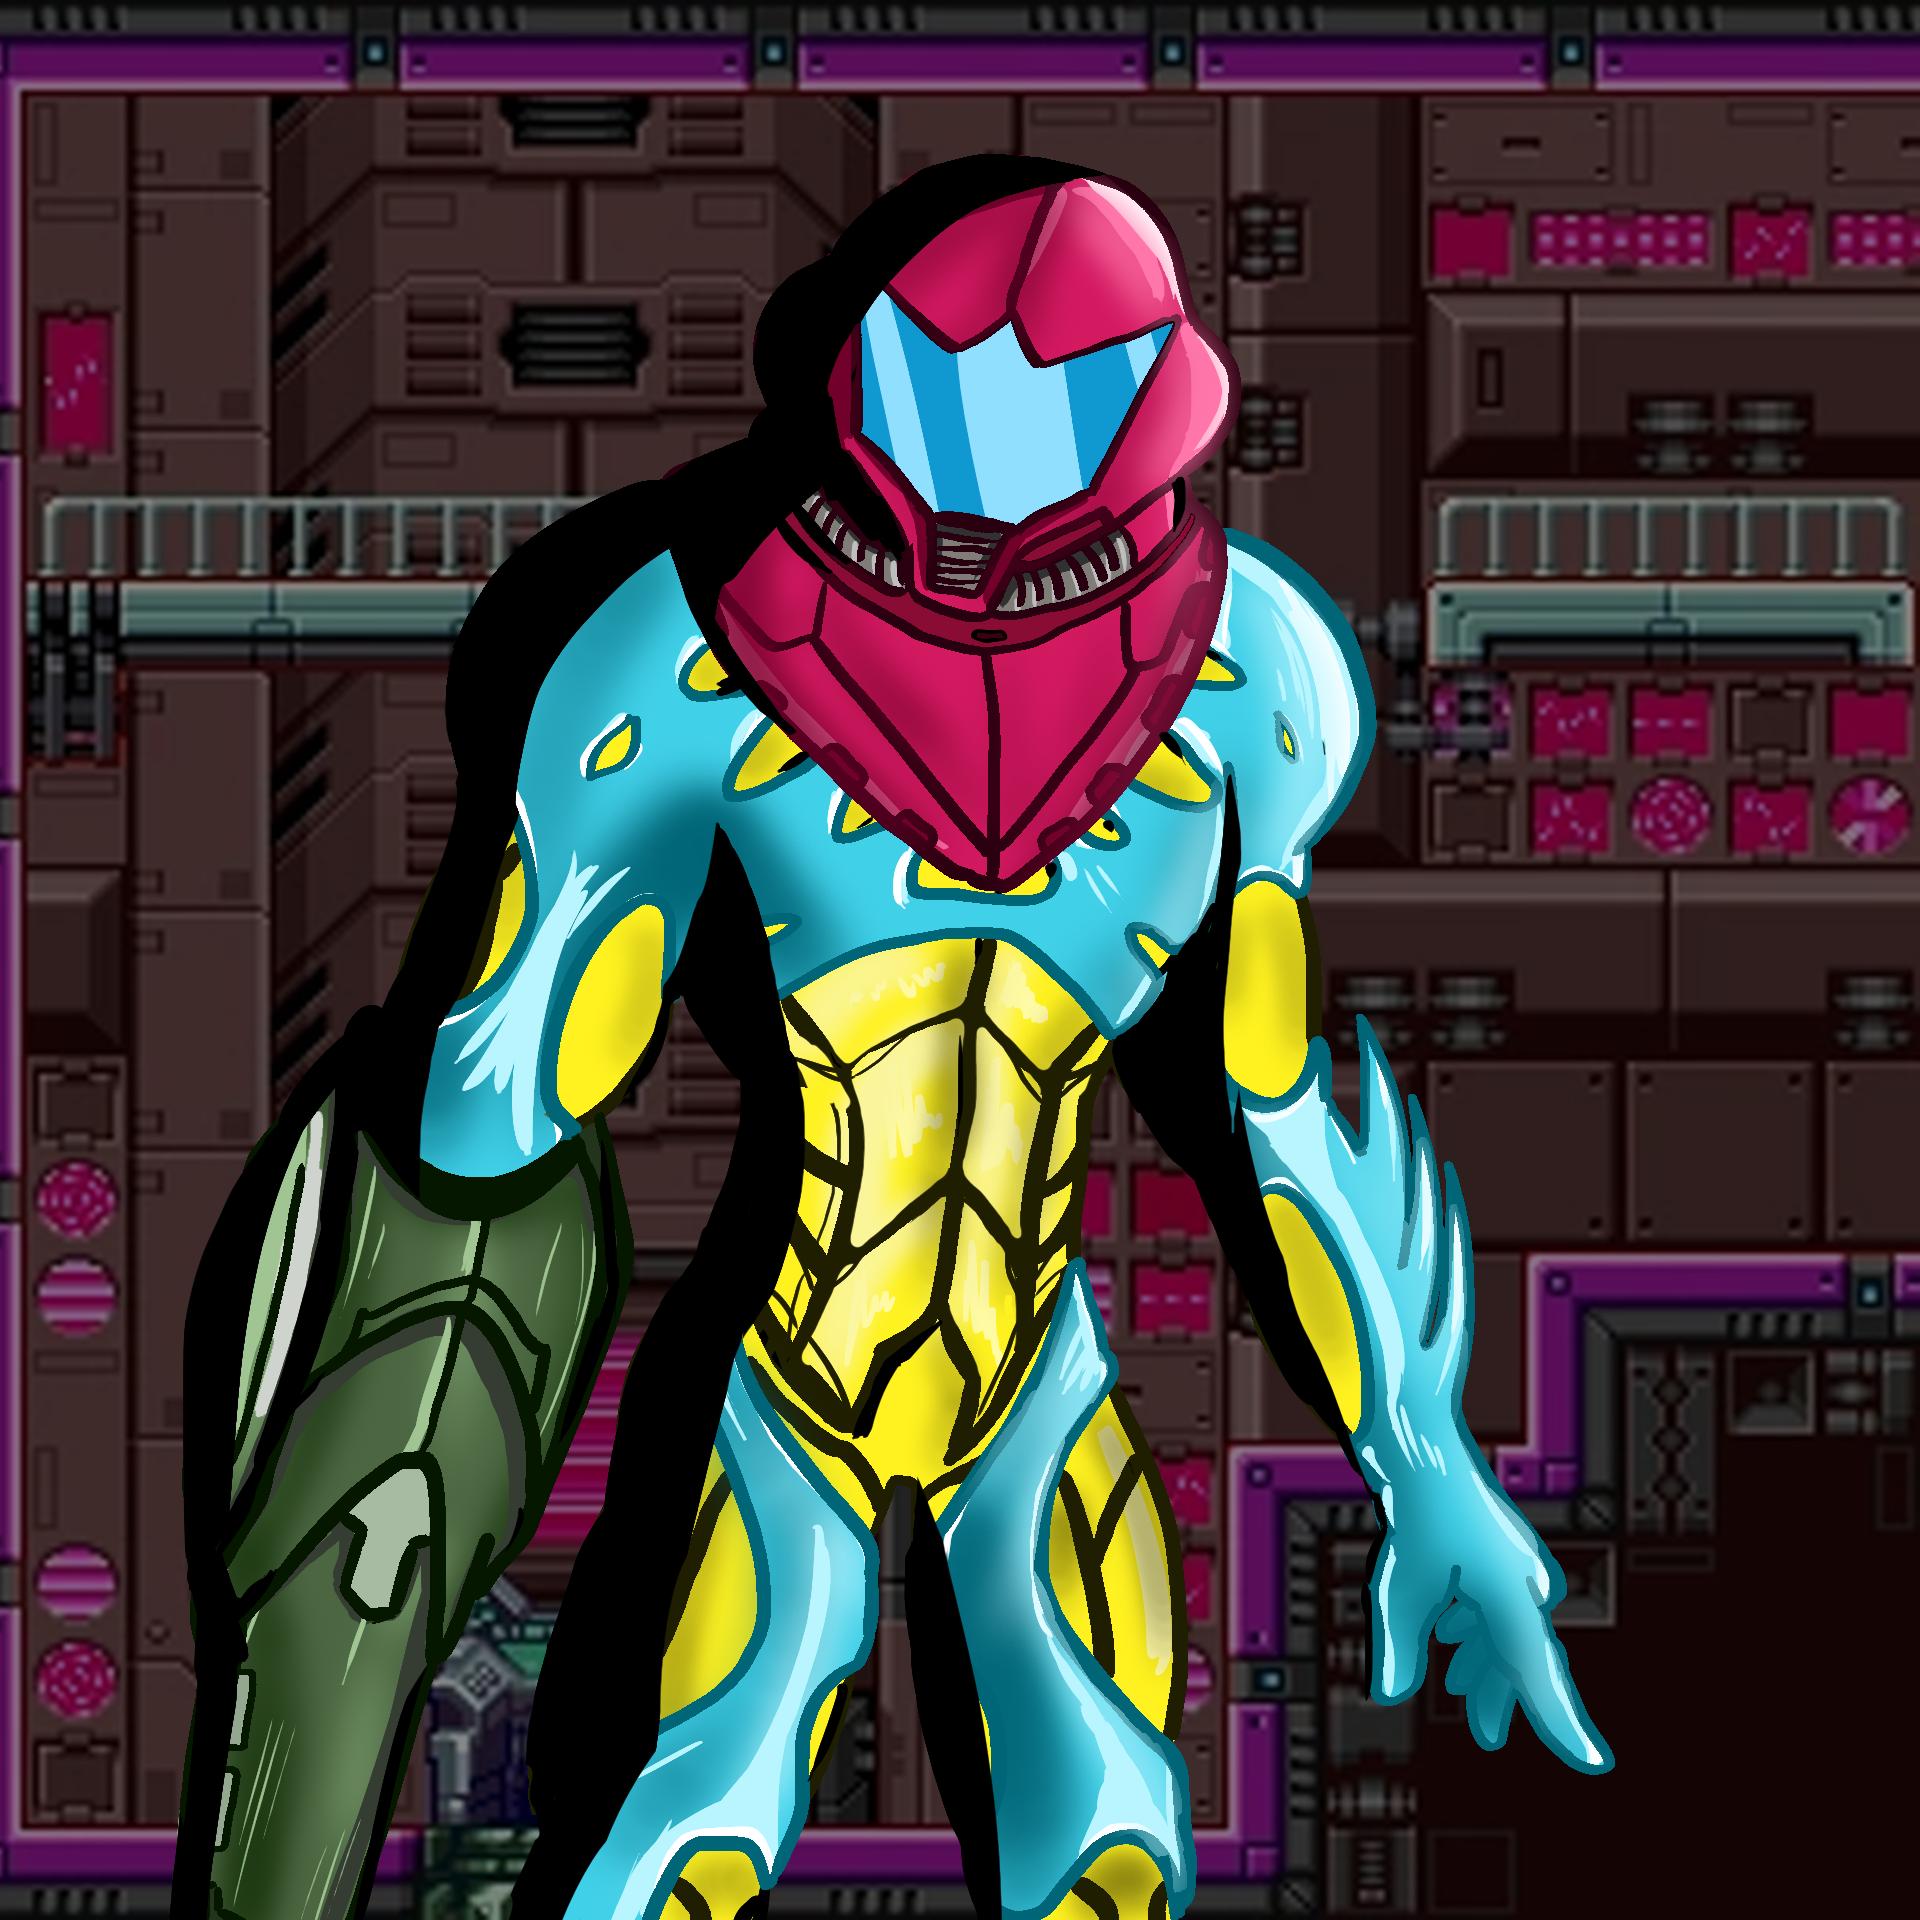 Metroid Fusion - Power Suit